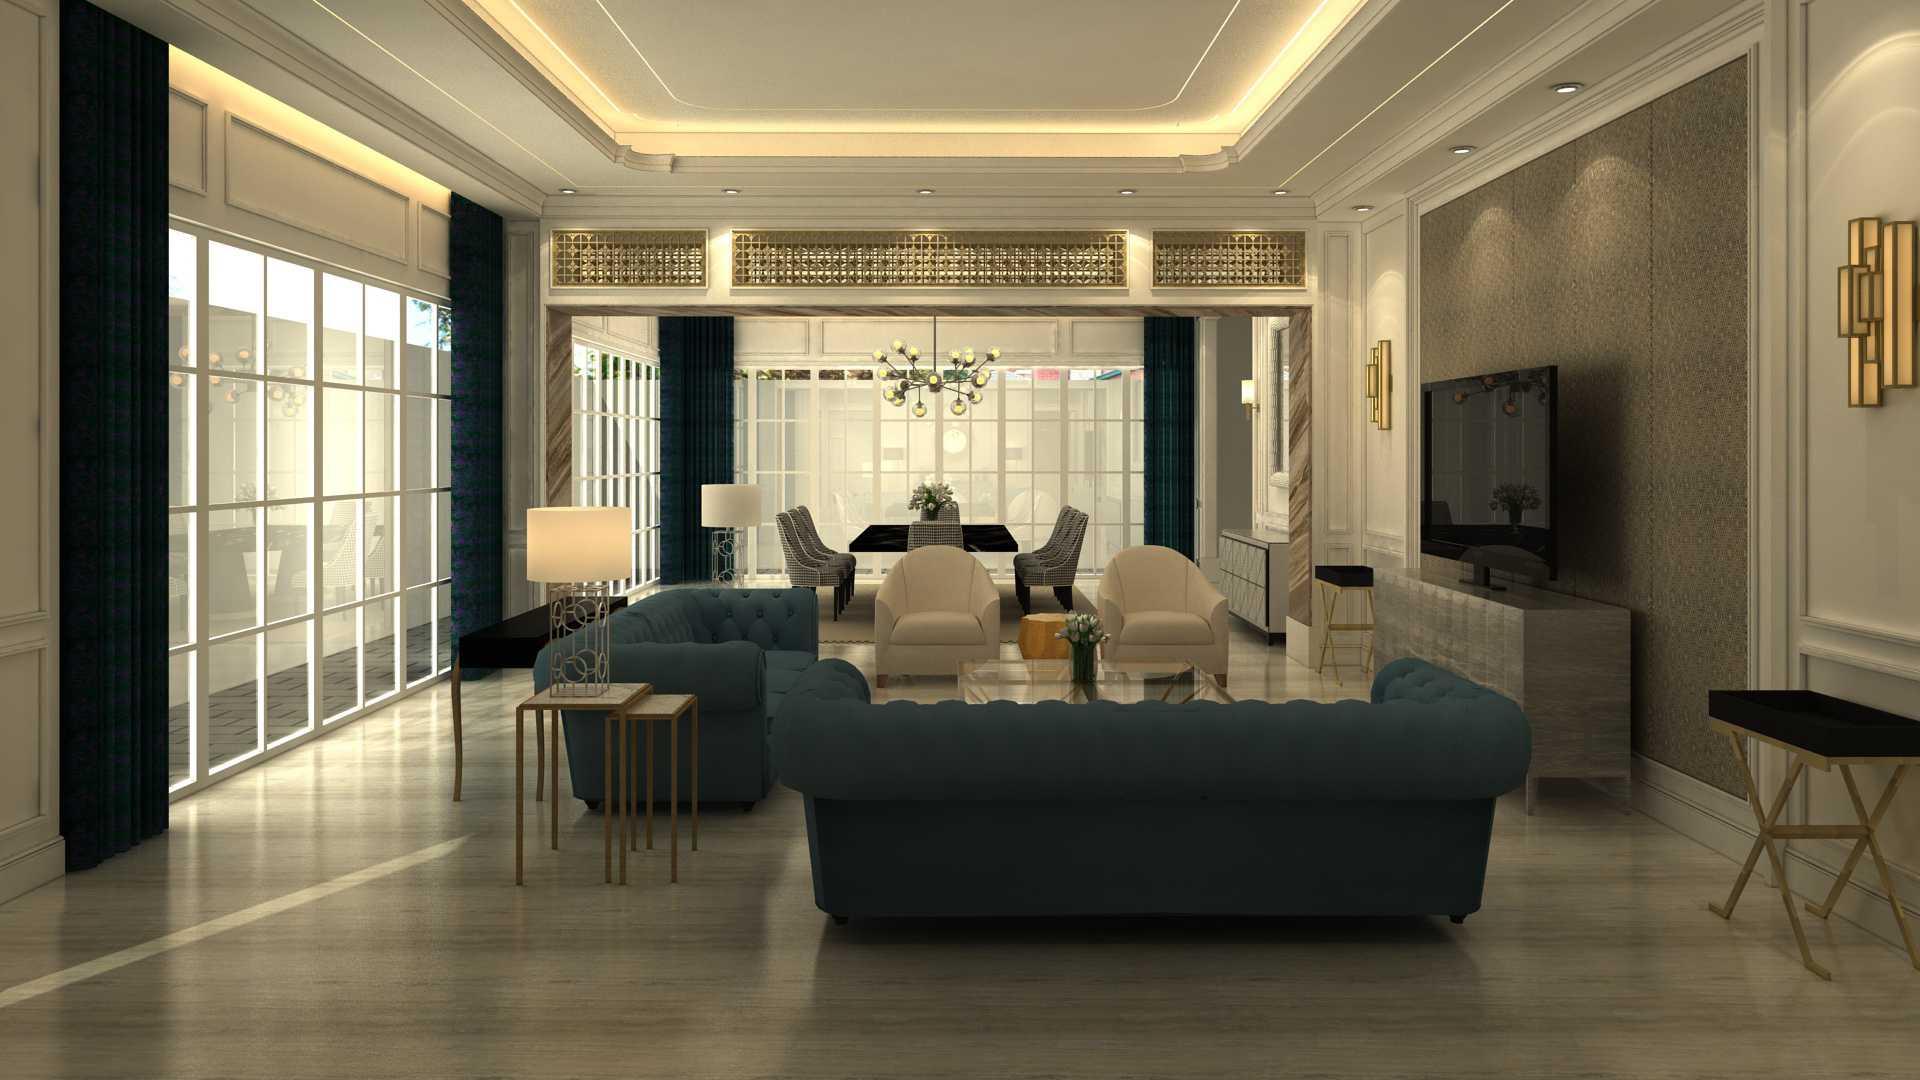 Vin•da•te Residence @ Semarang Semarang - Indonesia Semarang - Indonesia Livingroom Kontemporer  17633